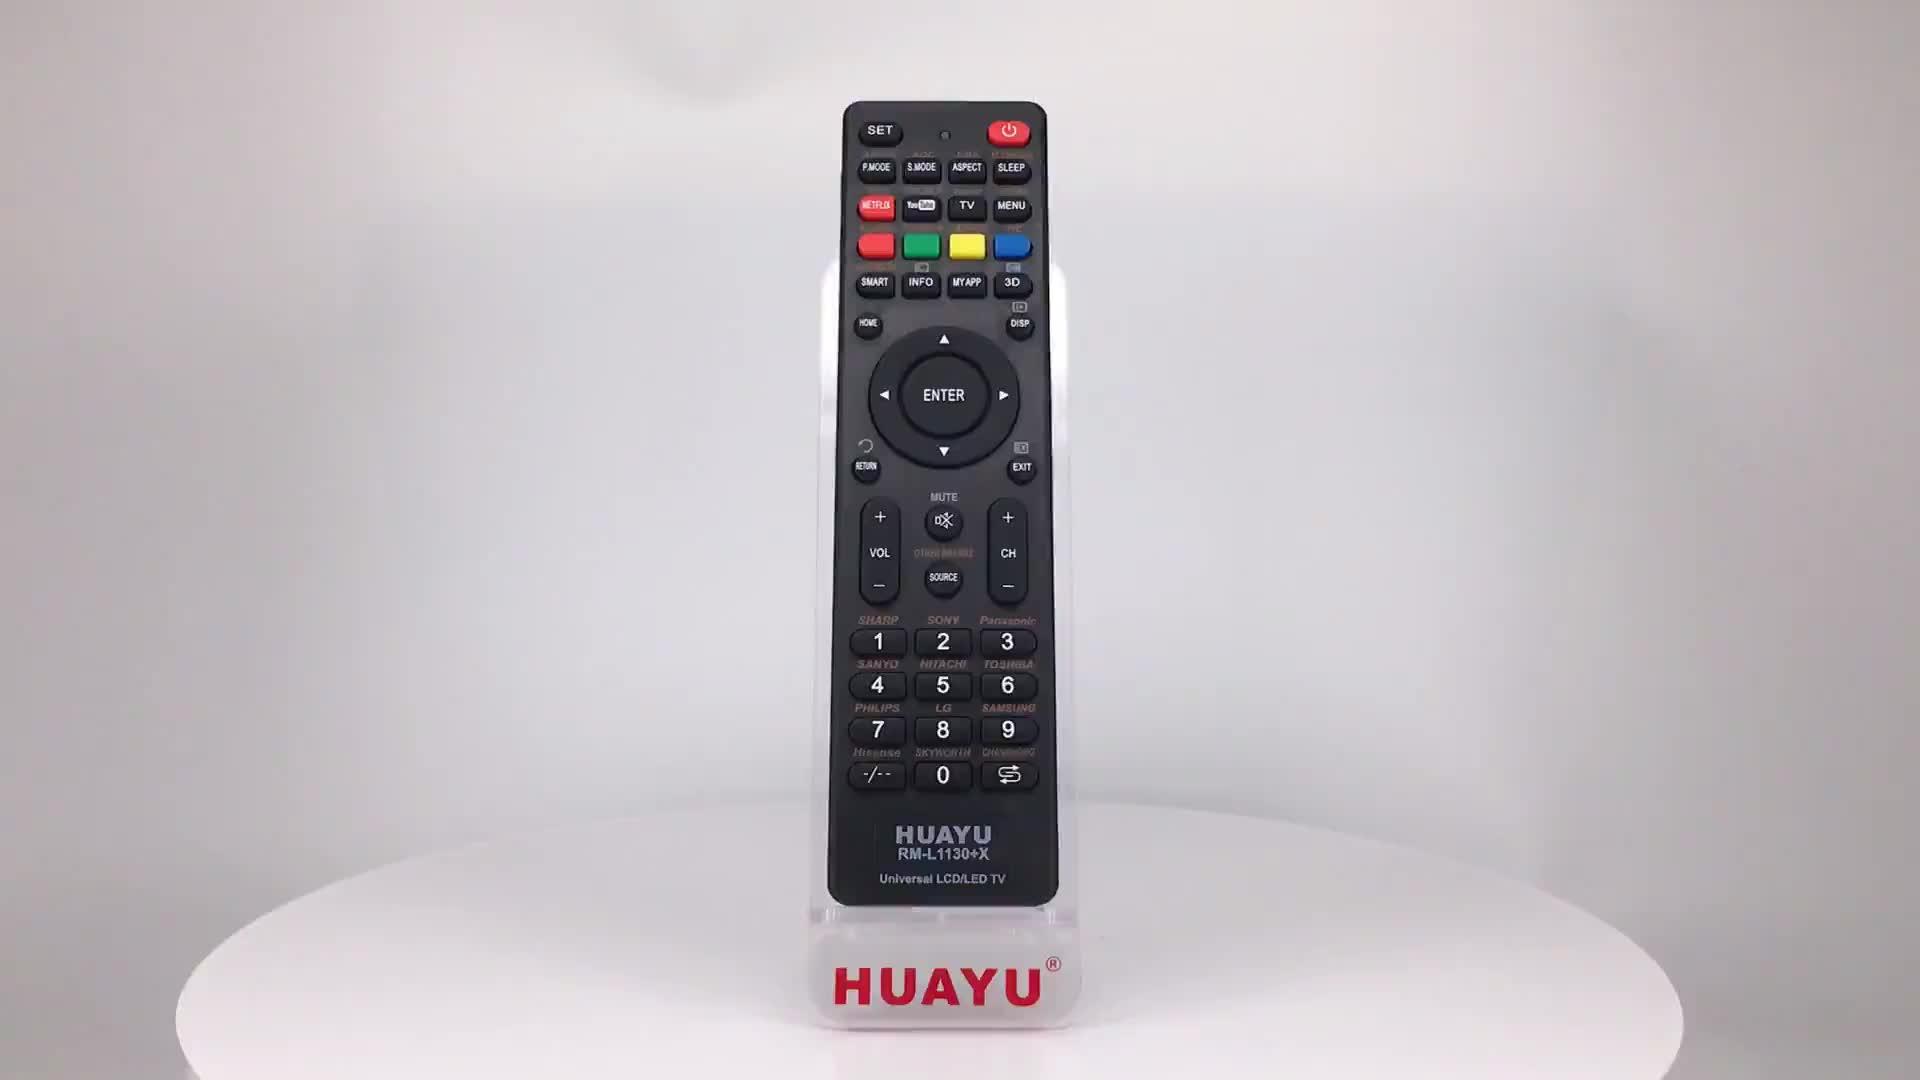 RM-L1130 + X HUAYU UNIVERSAL IR REMOTE kontrol TV TV KONTROL